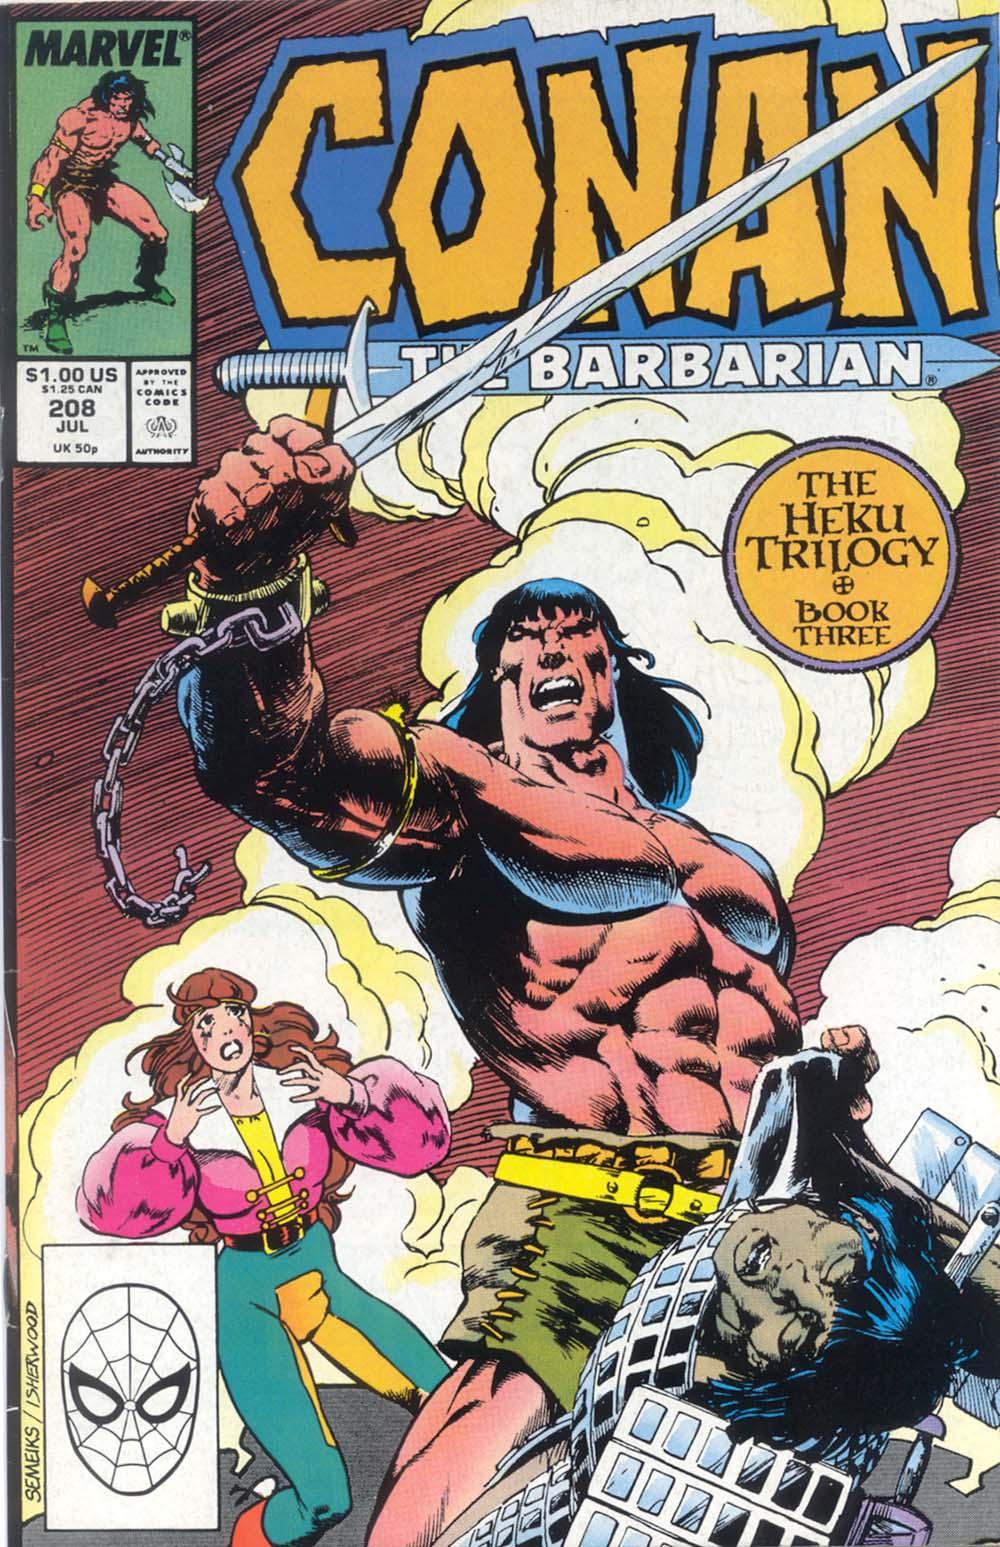 Conan the Barbarian 208